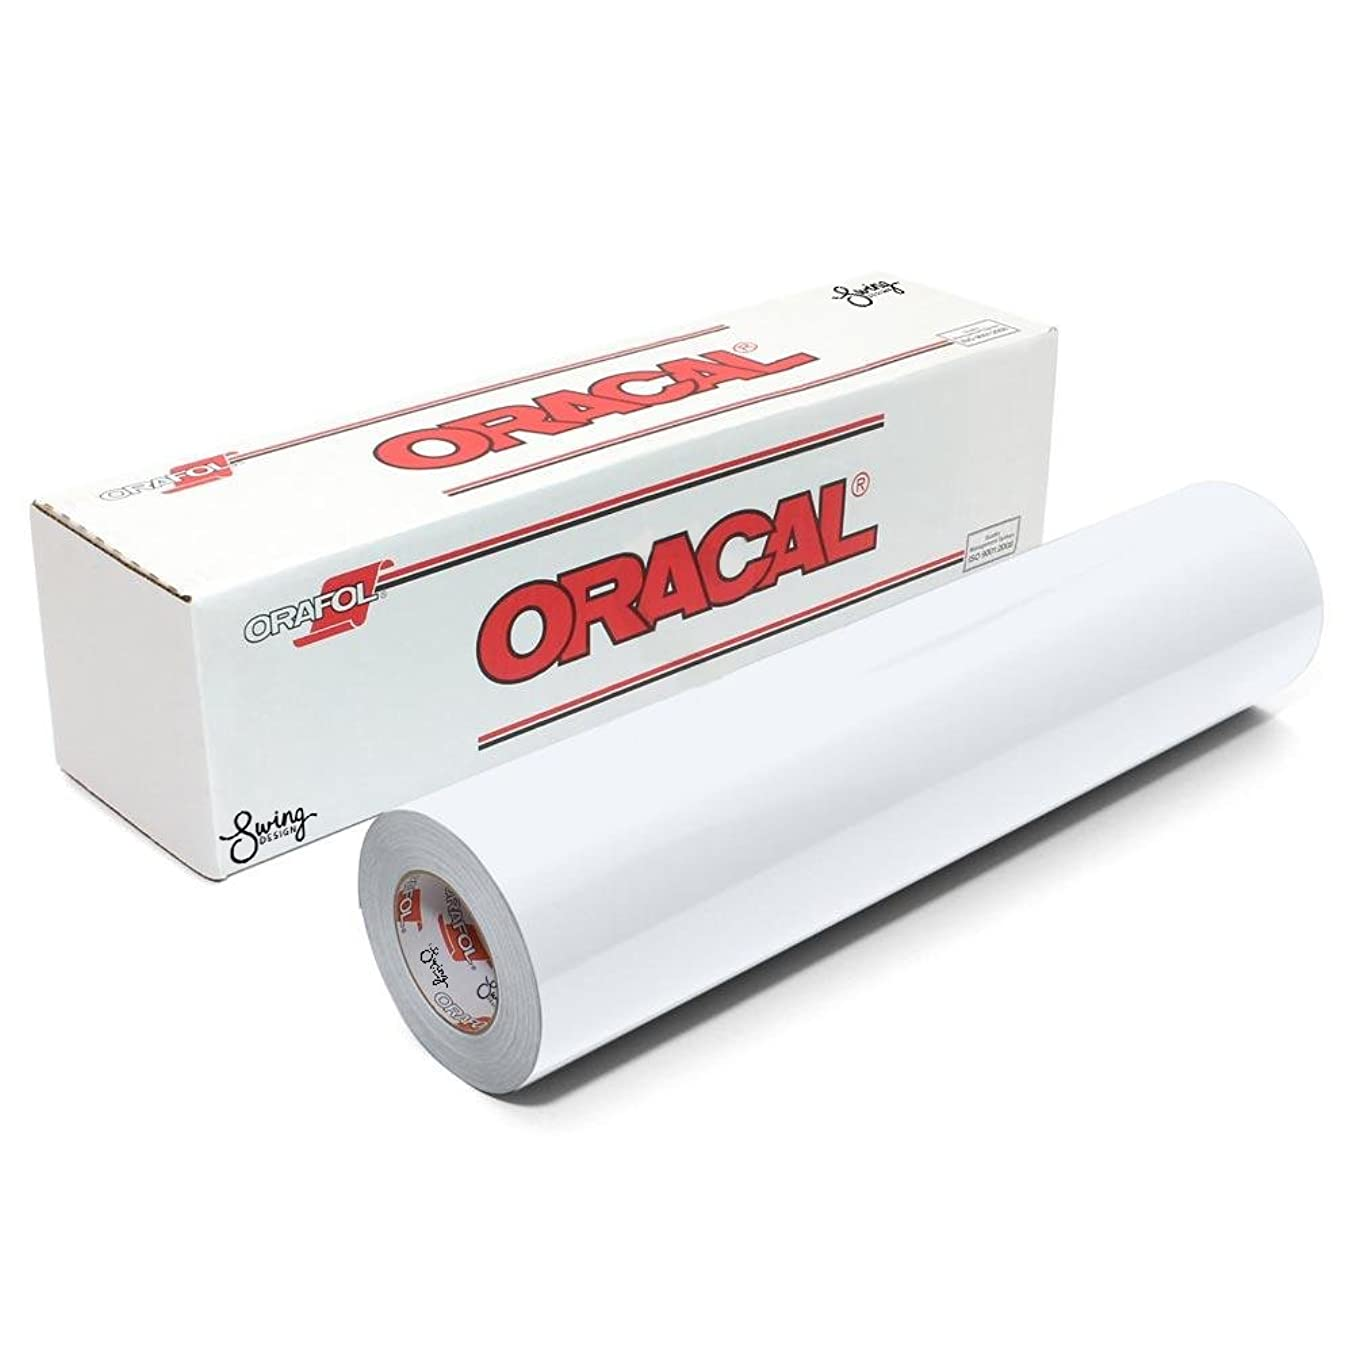 Oracal 651 Permanent Glossy Vinyl - White - 12